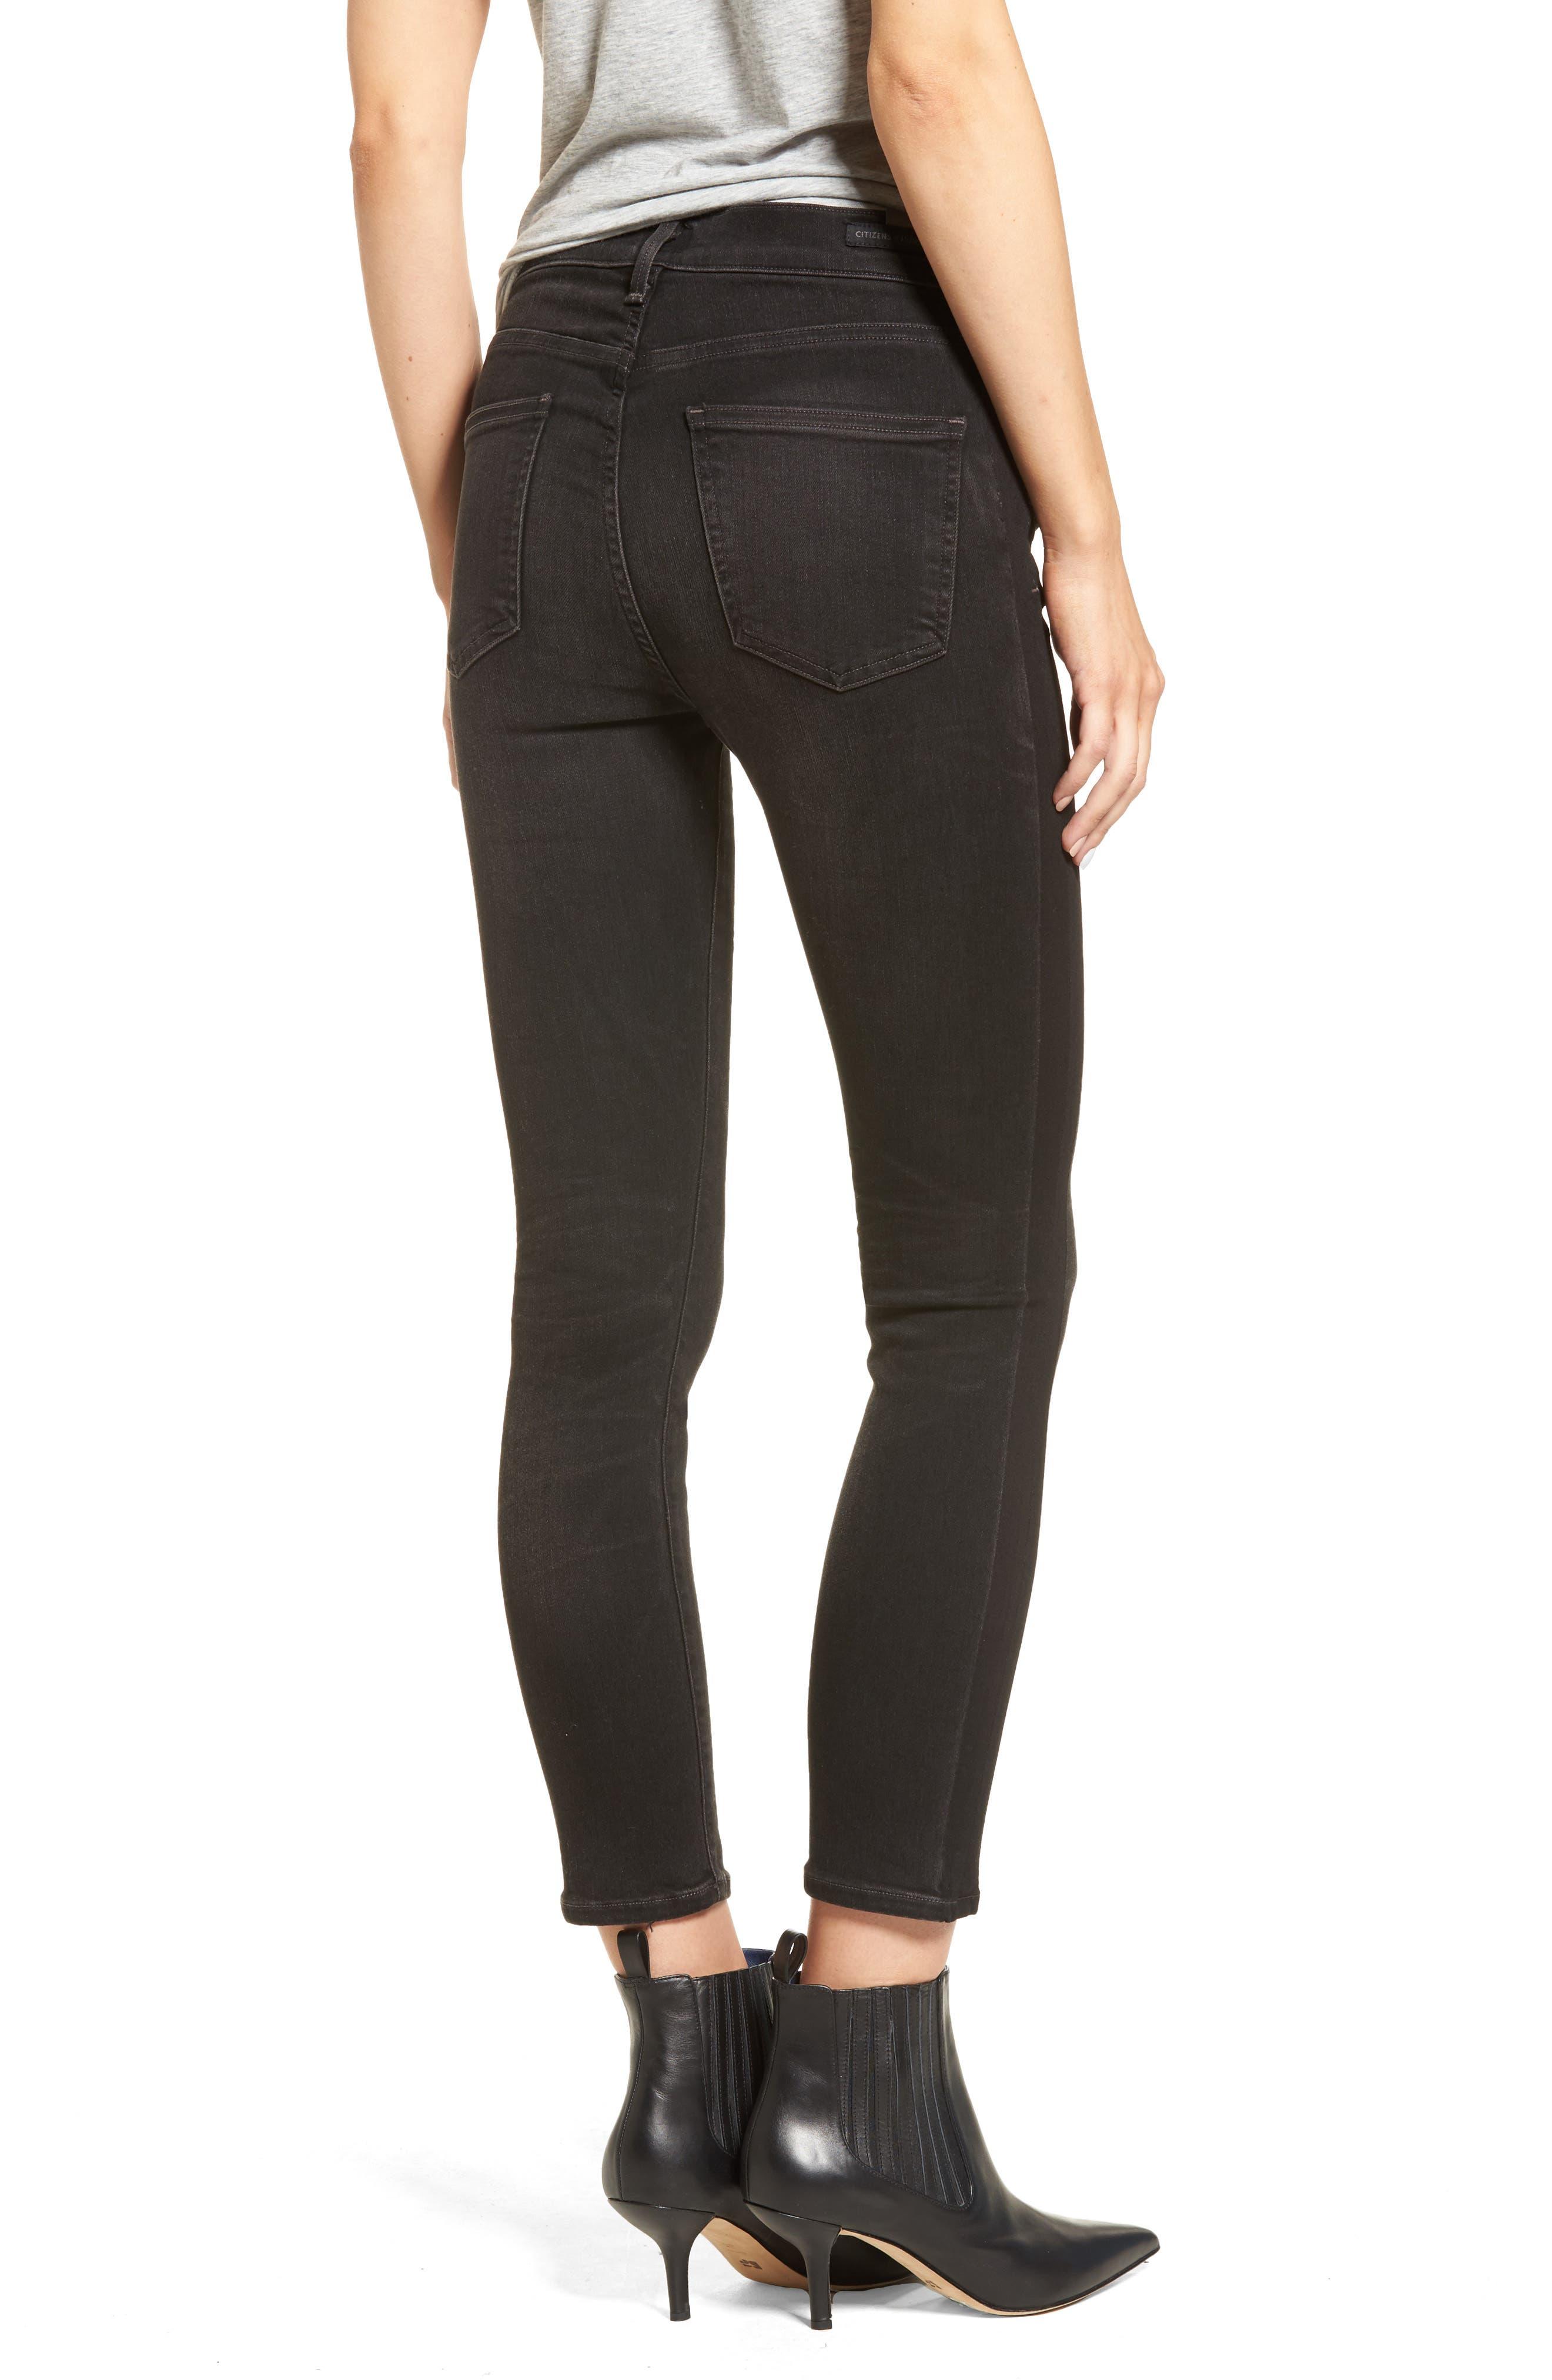 Rocket High Waist Crop Skinny Jeans,                             Alternate thumbnail 2, color,                             009